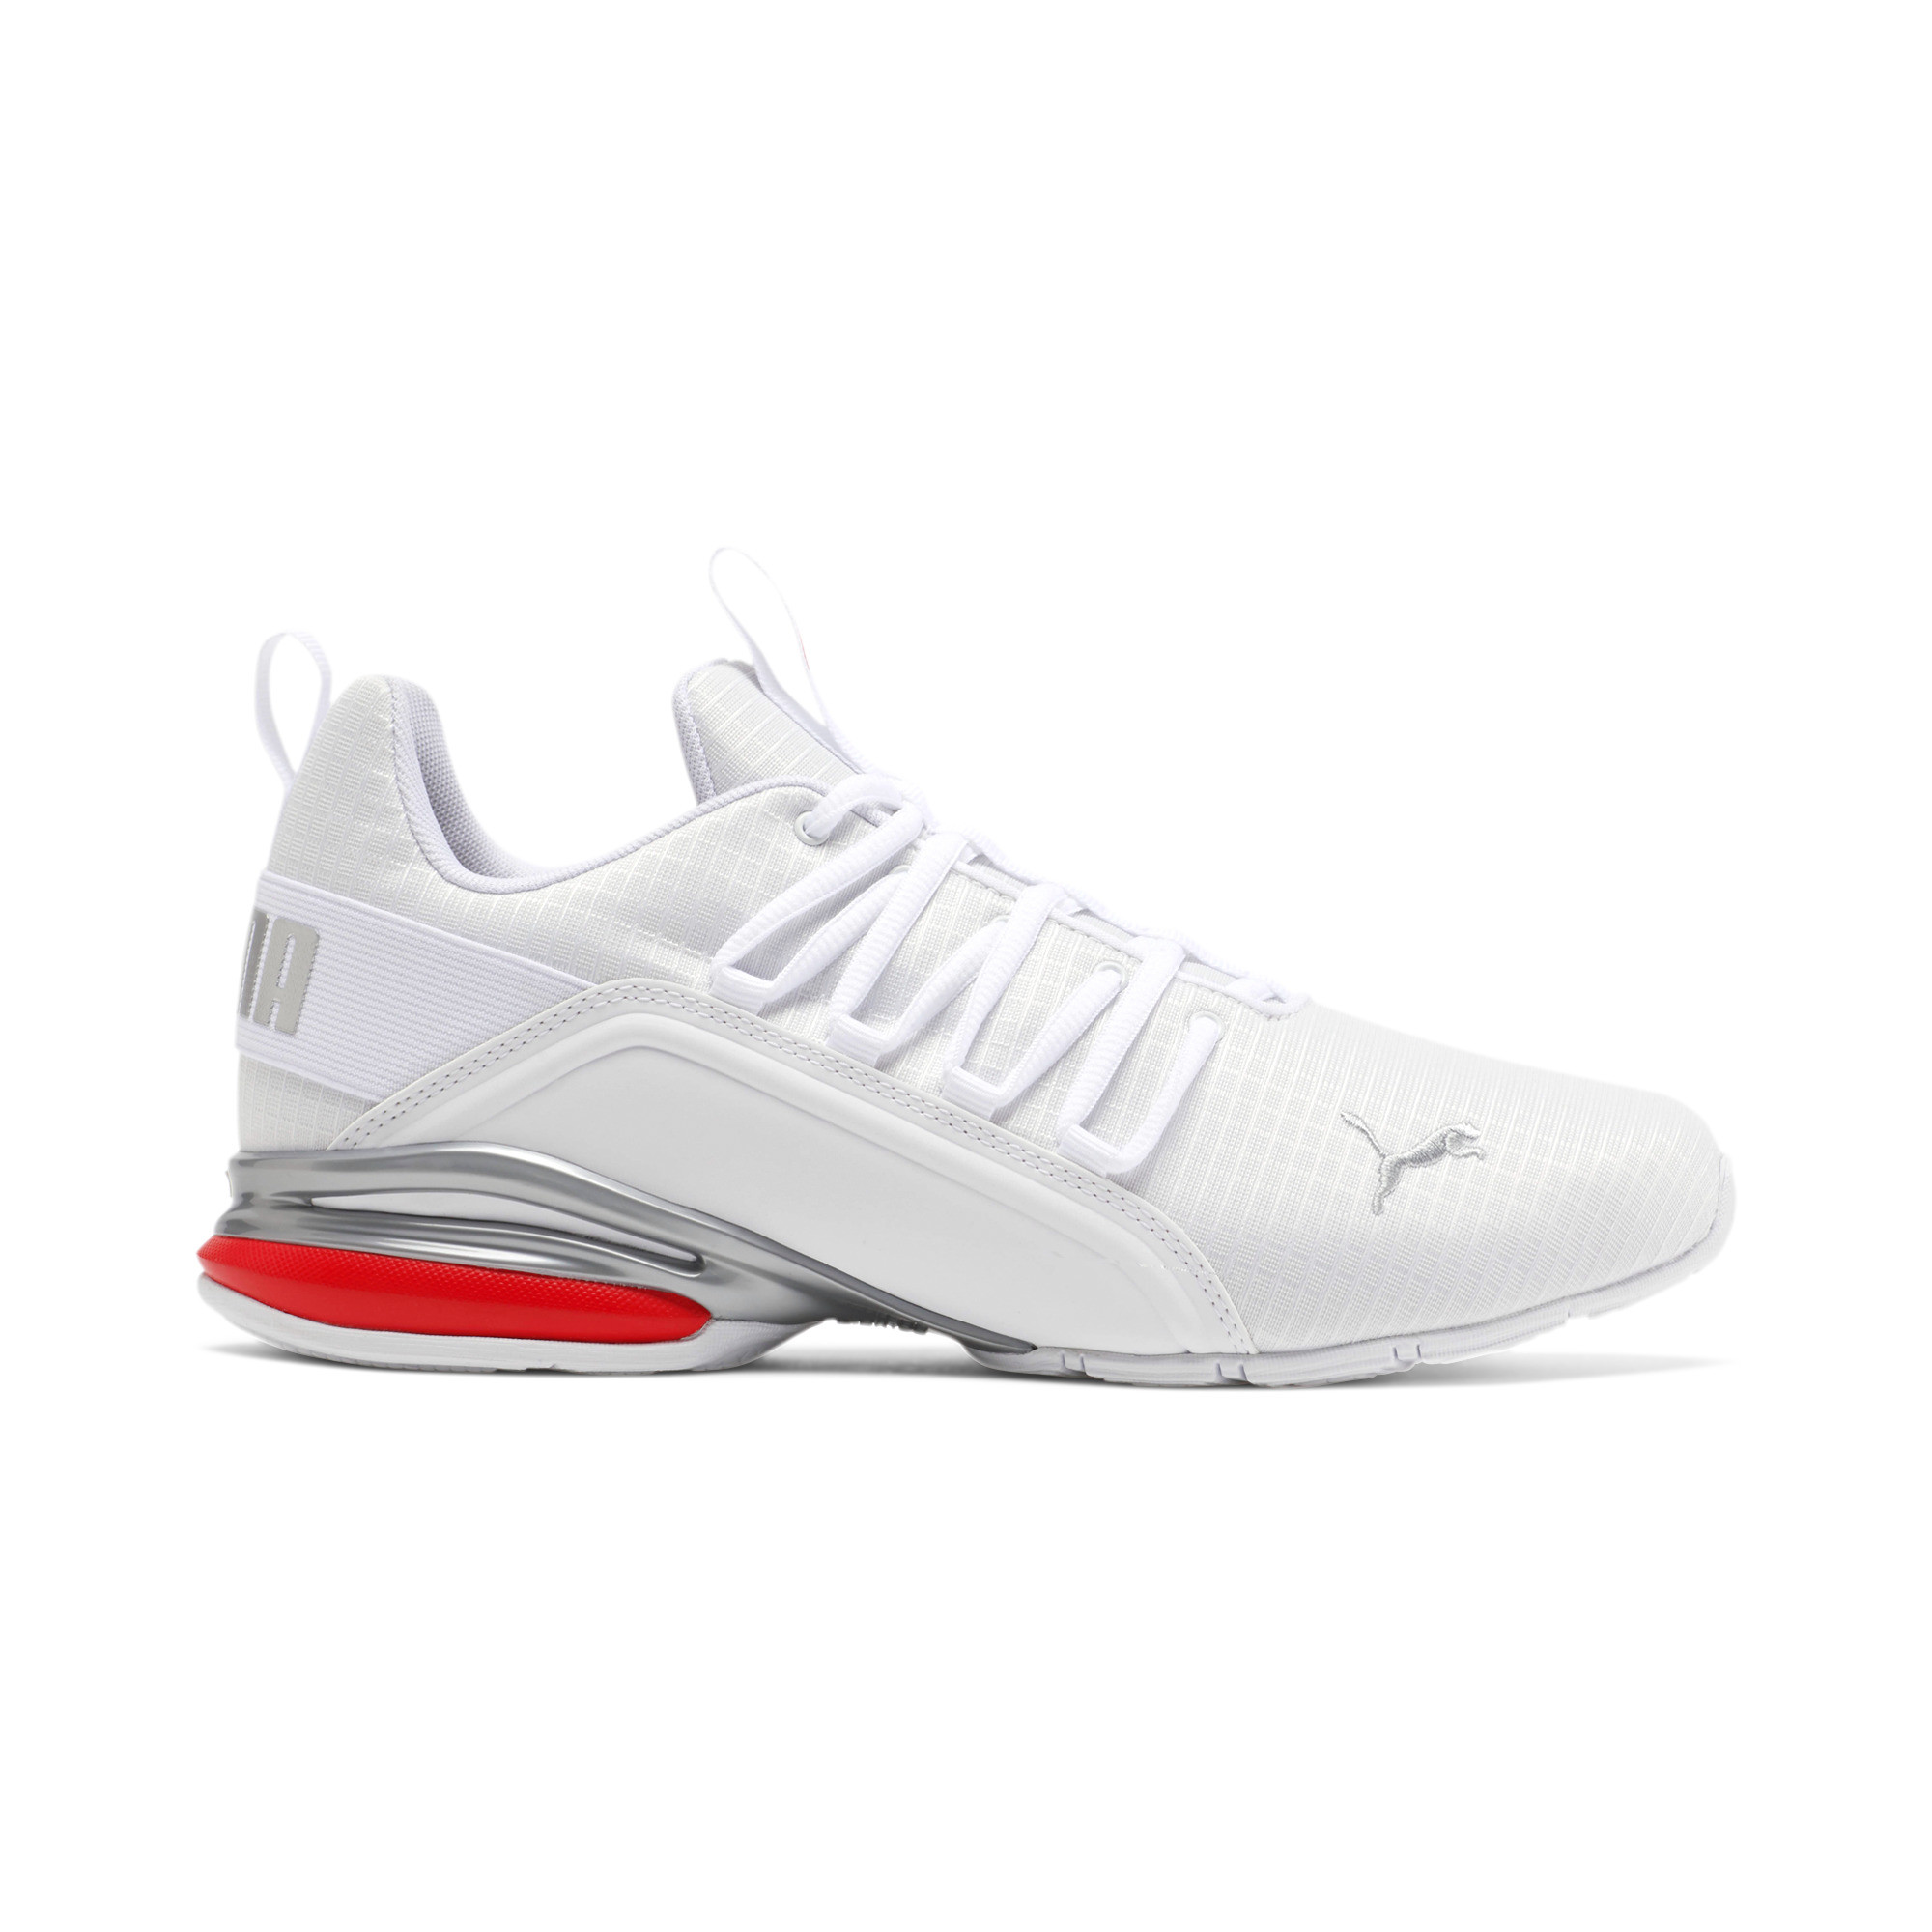 PUMA-Men-039-s-Momenta-Ripstop-Training-Shoes thumbnail 6